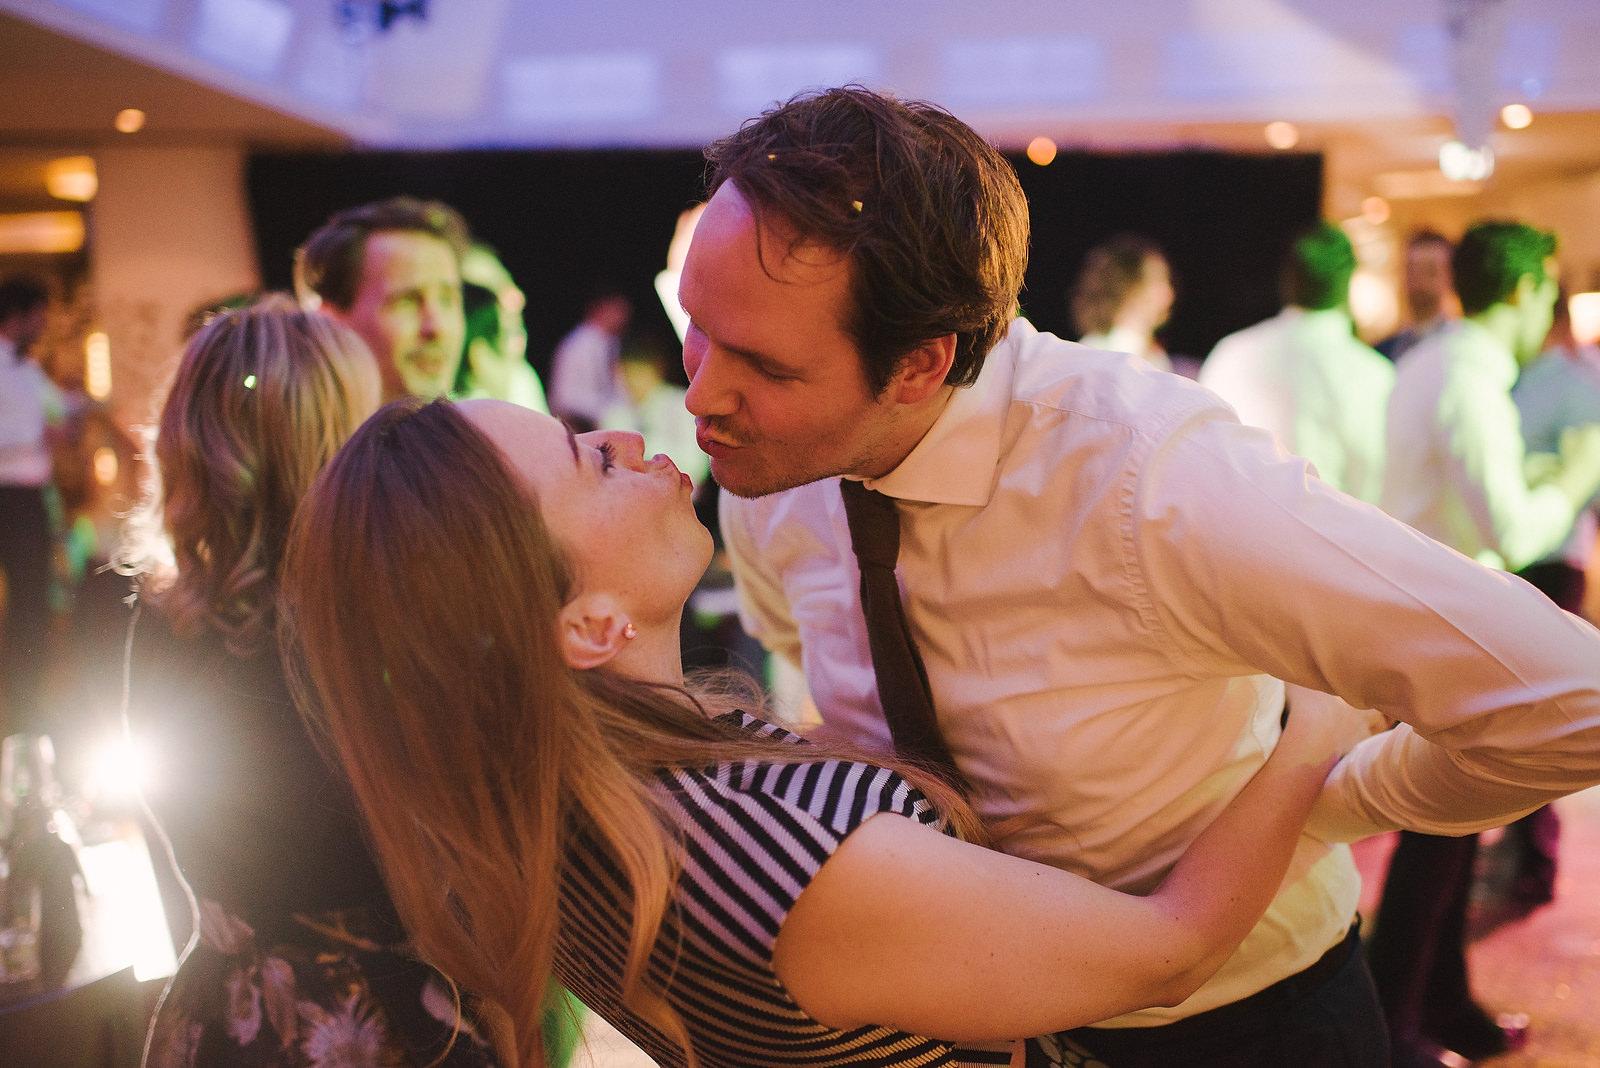 Fotograf Konstanz - Silvester Wedding in Hagnau / Friedrichshafen at Lake of Constance  - 57 -